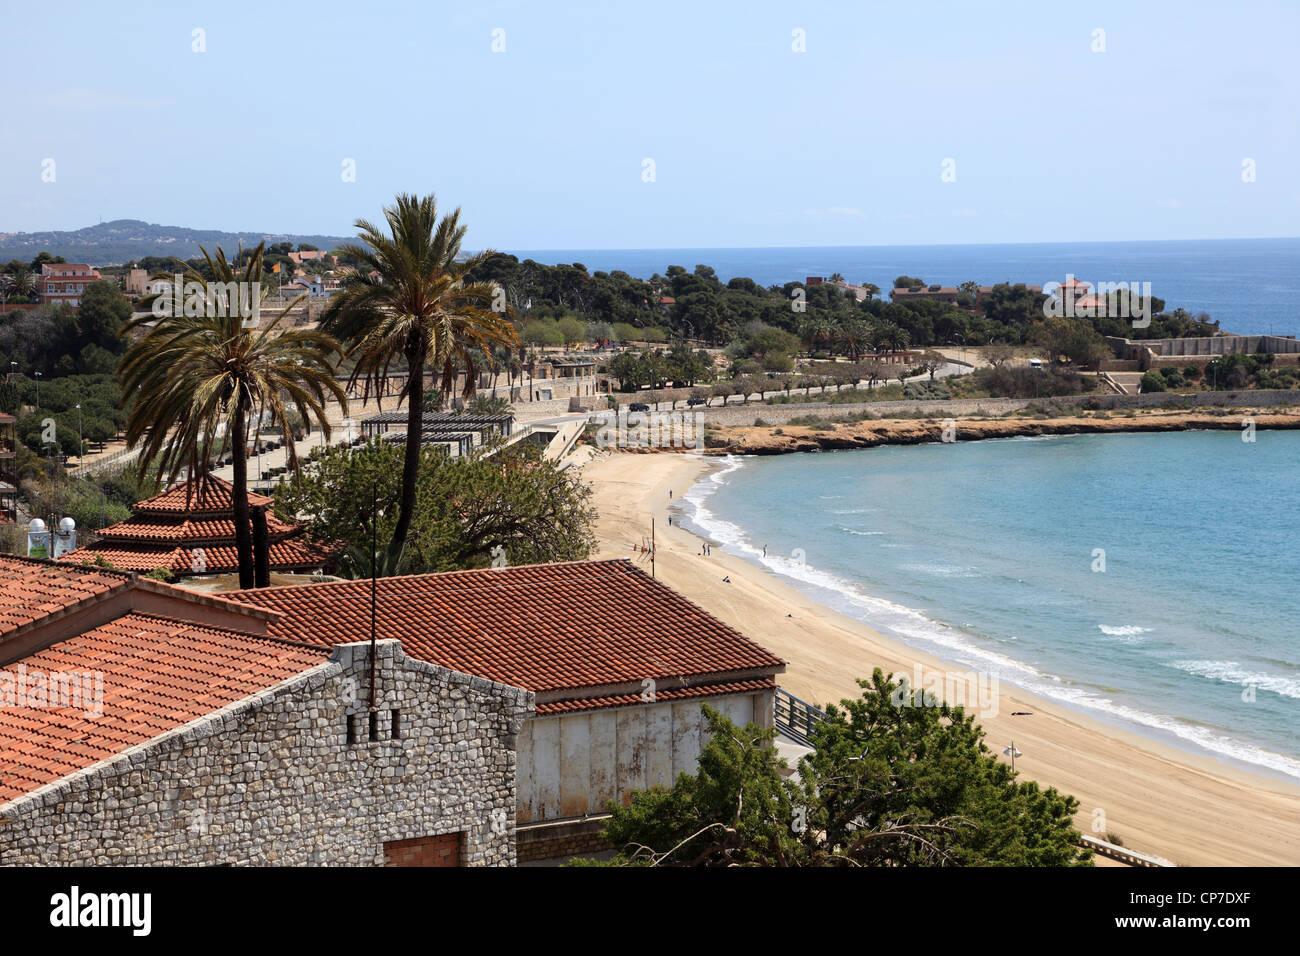 Blick auf den Strand in Tarragona, Spanien Stockbild